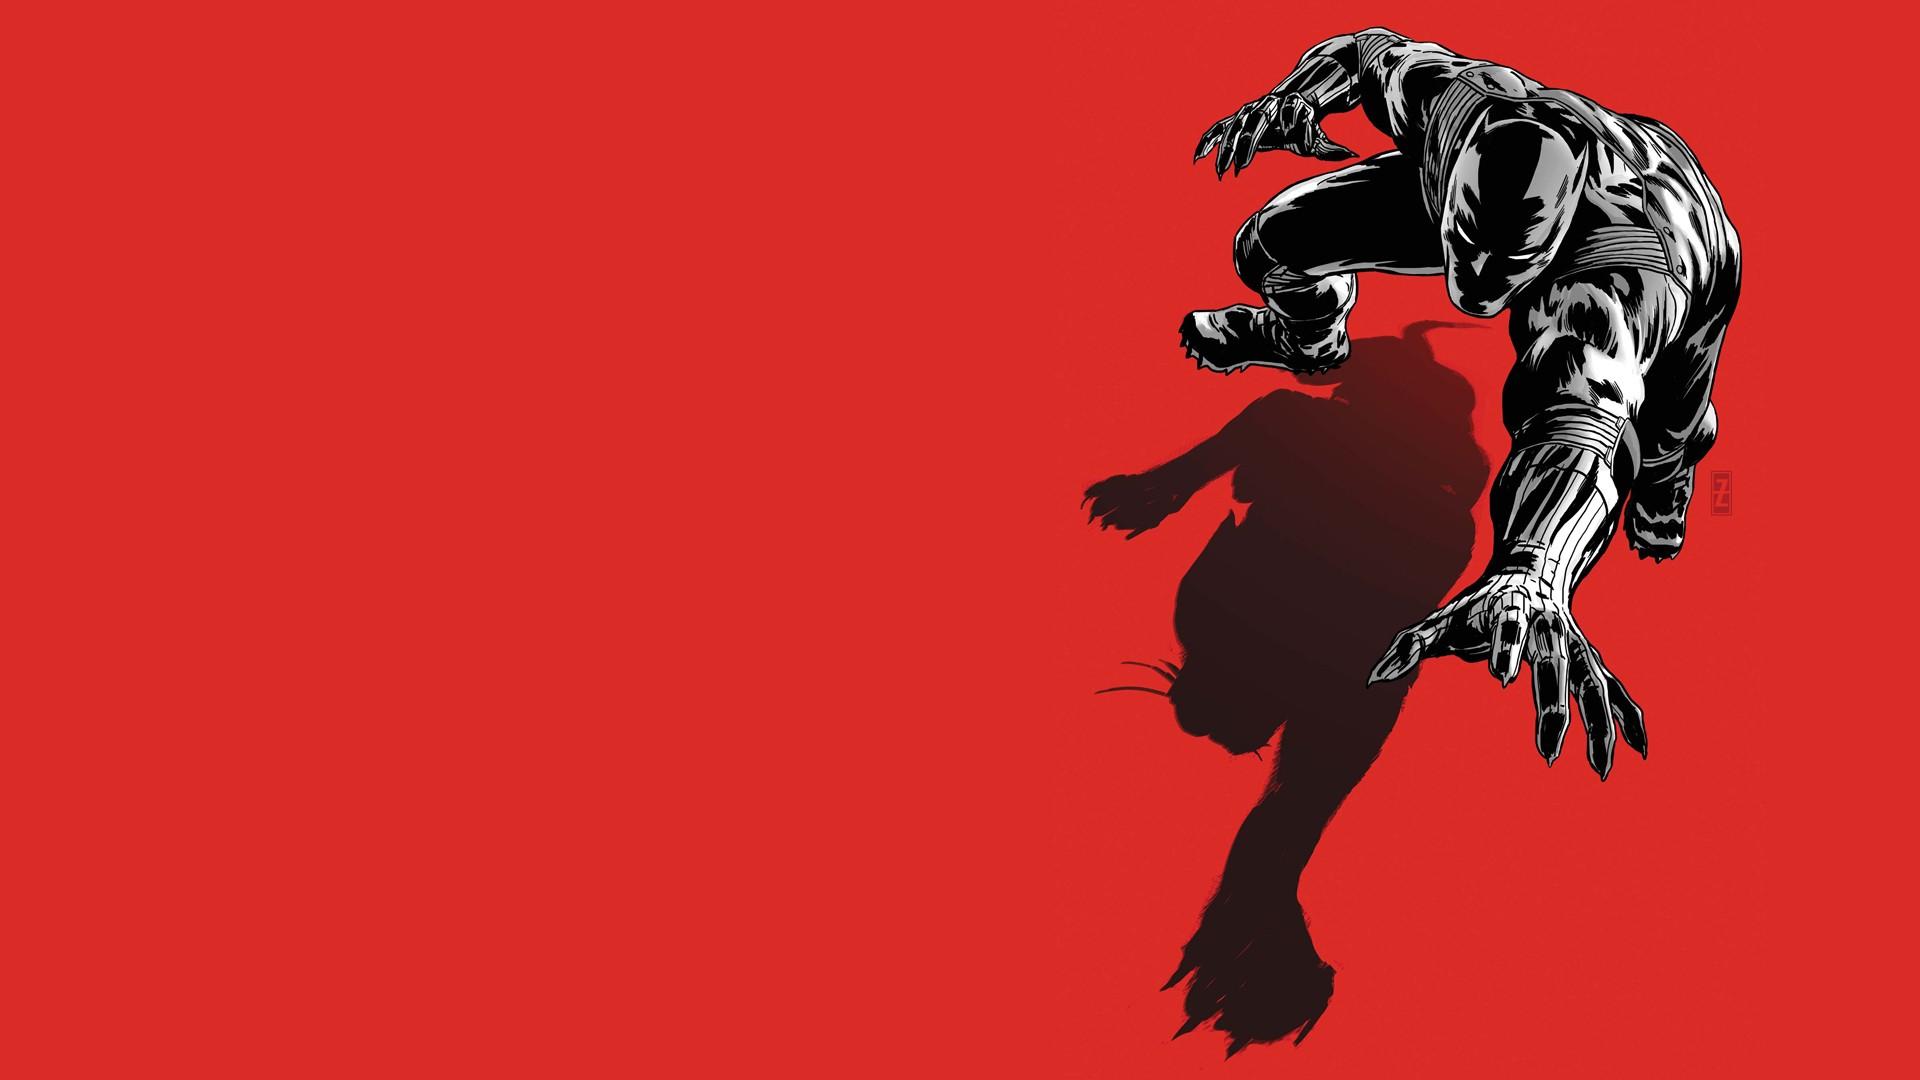 Black Panther Comic Wallpaper: Black Panther Computer Wallpapers, Desktop Backgrounds